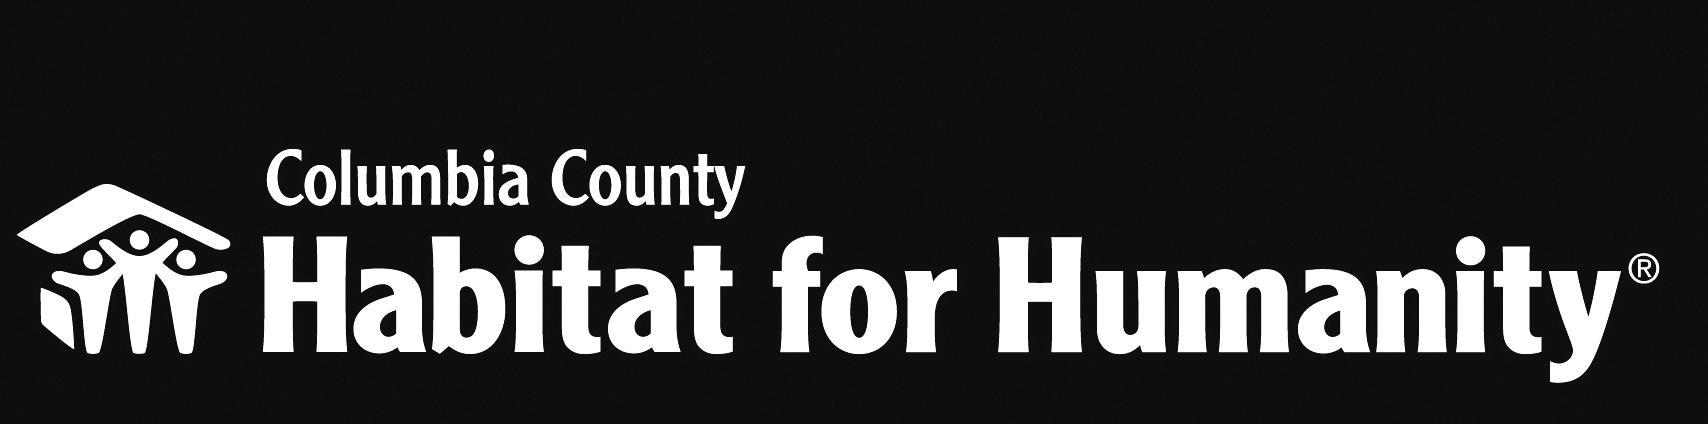 Columbia County Habitat for Humanity